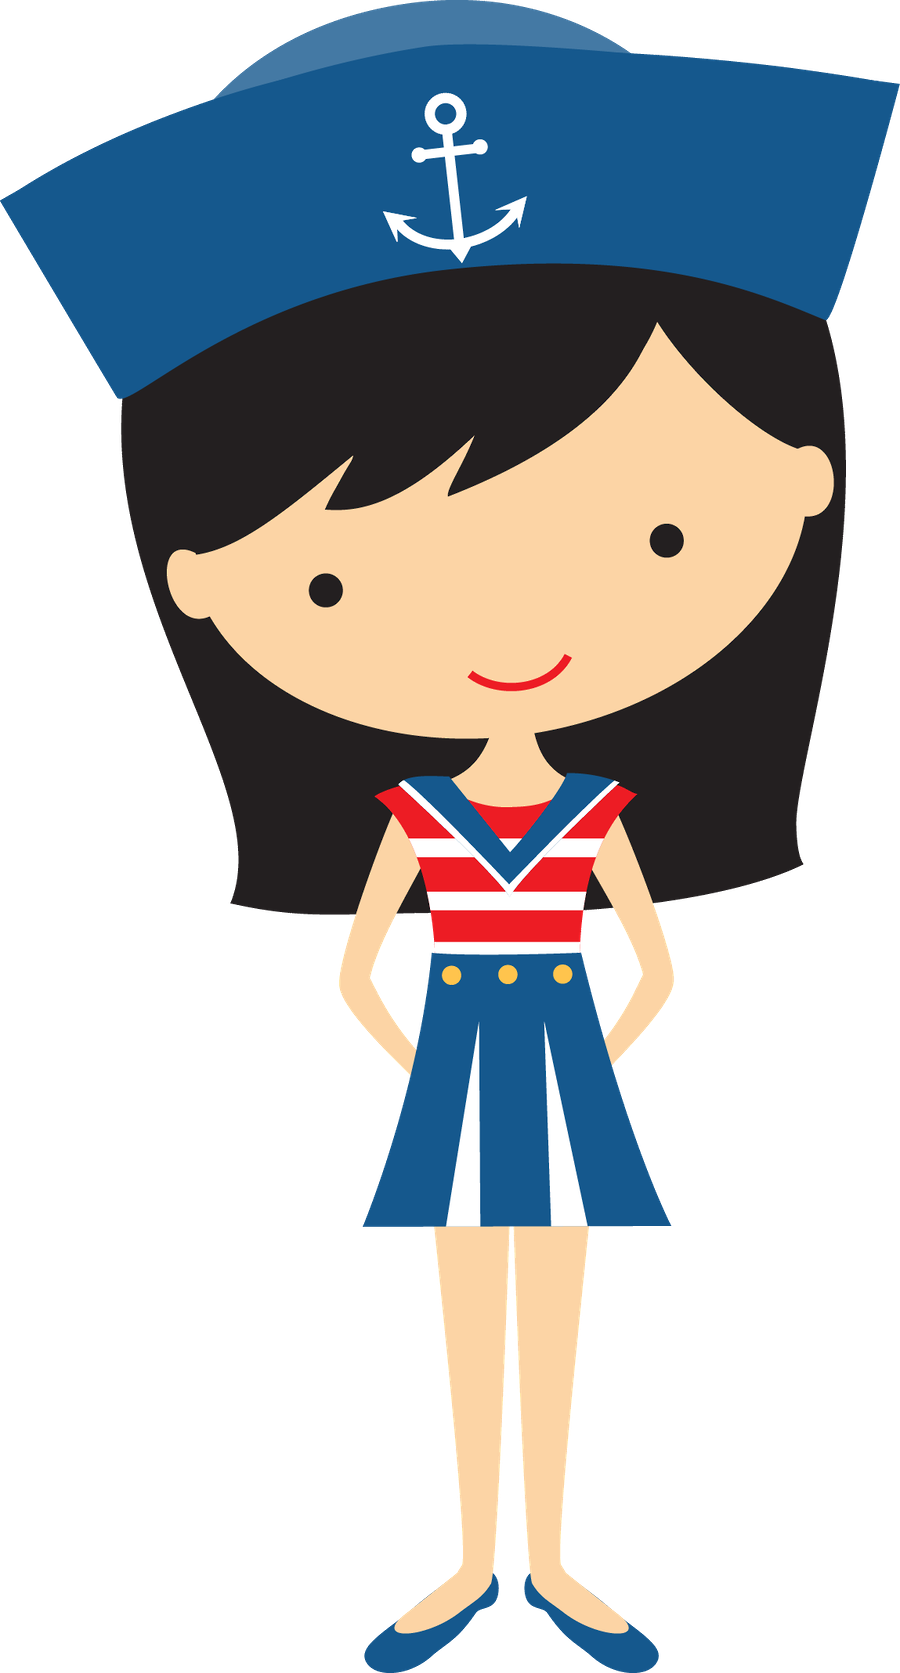 Sailor clipart female sailor. Free download best on